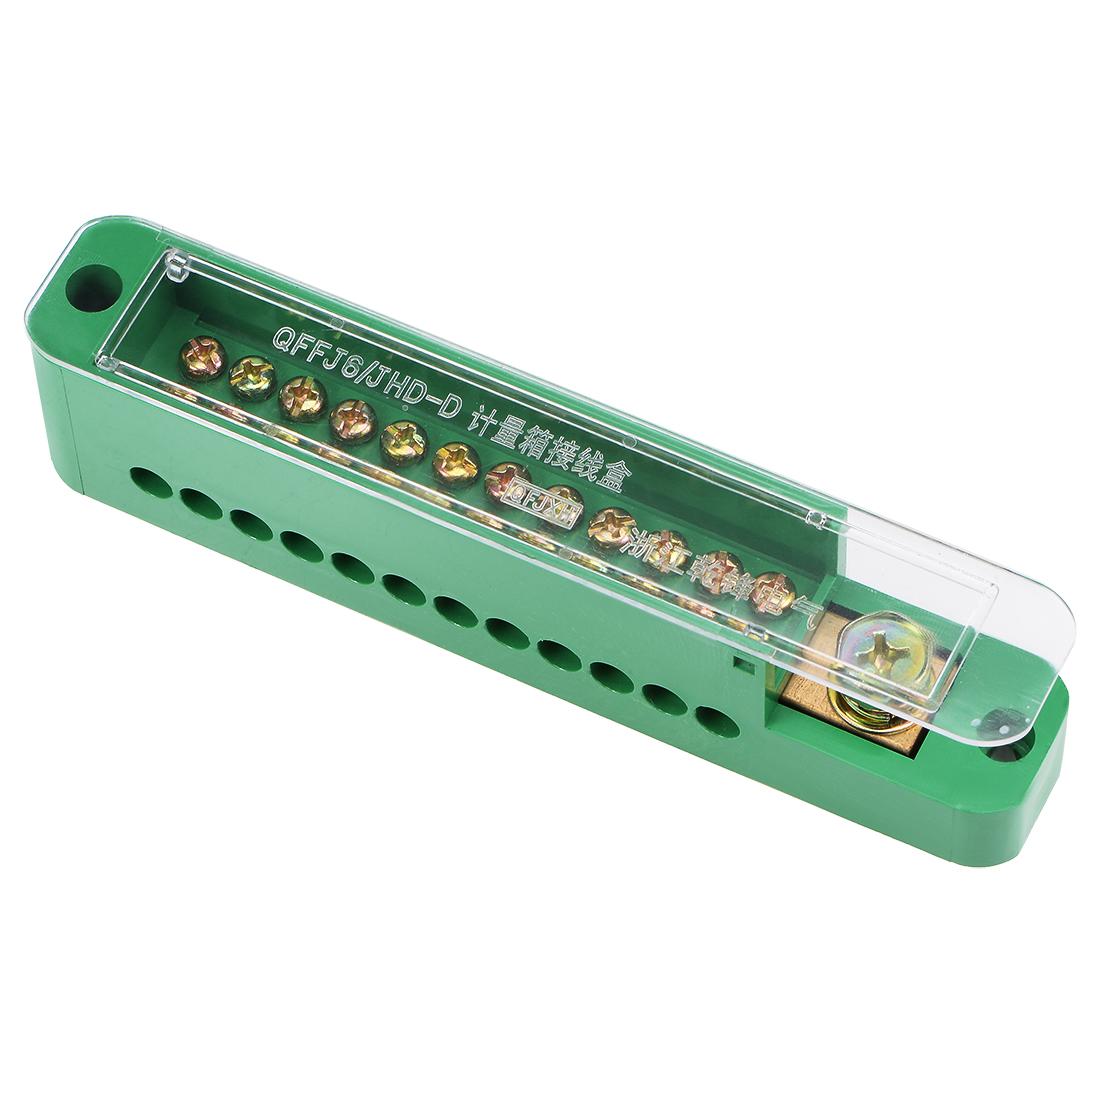 1 Inlet x 12 Outlet Terminal Strip Blocks Single Phase Distribution Block 1PCS